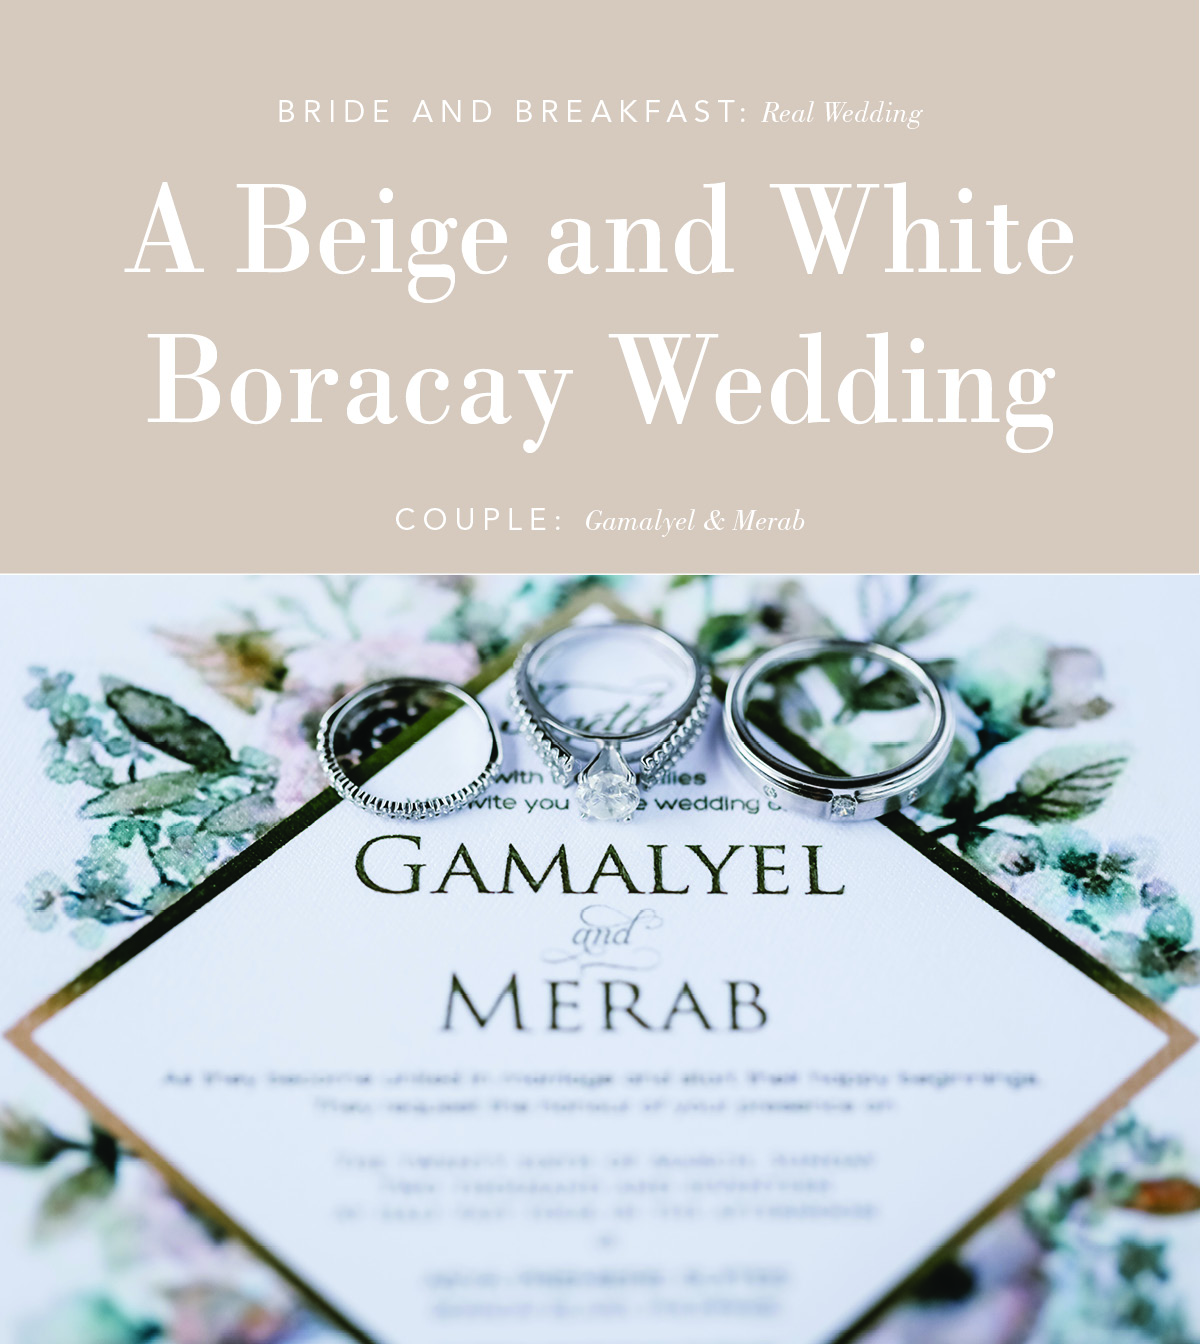 bnb-gamalyel-and-merab-wedding